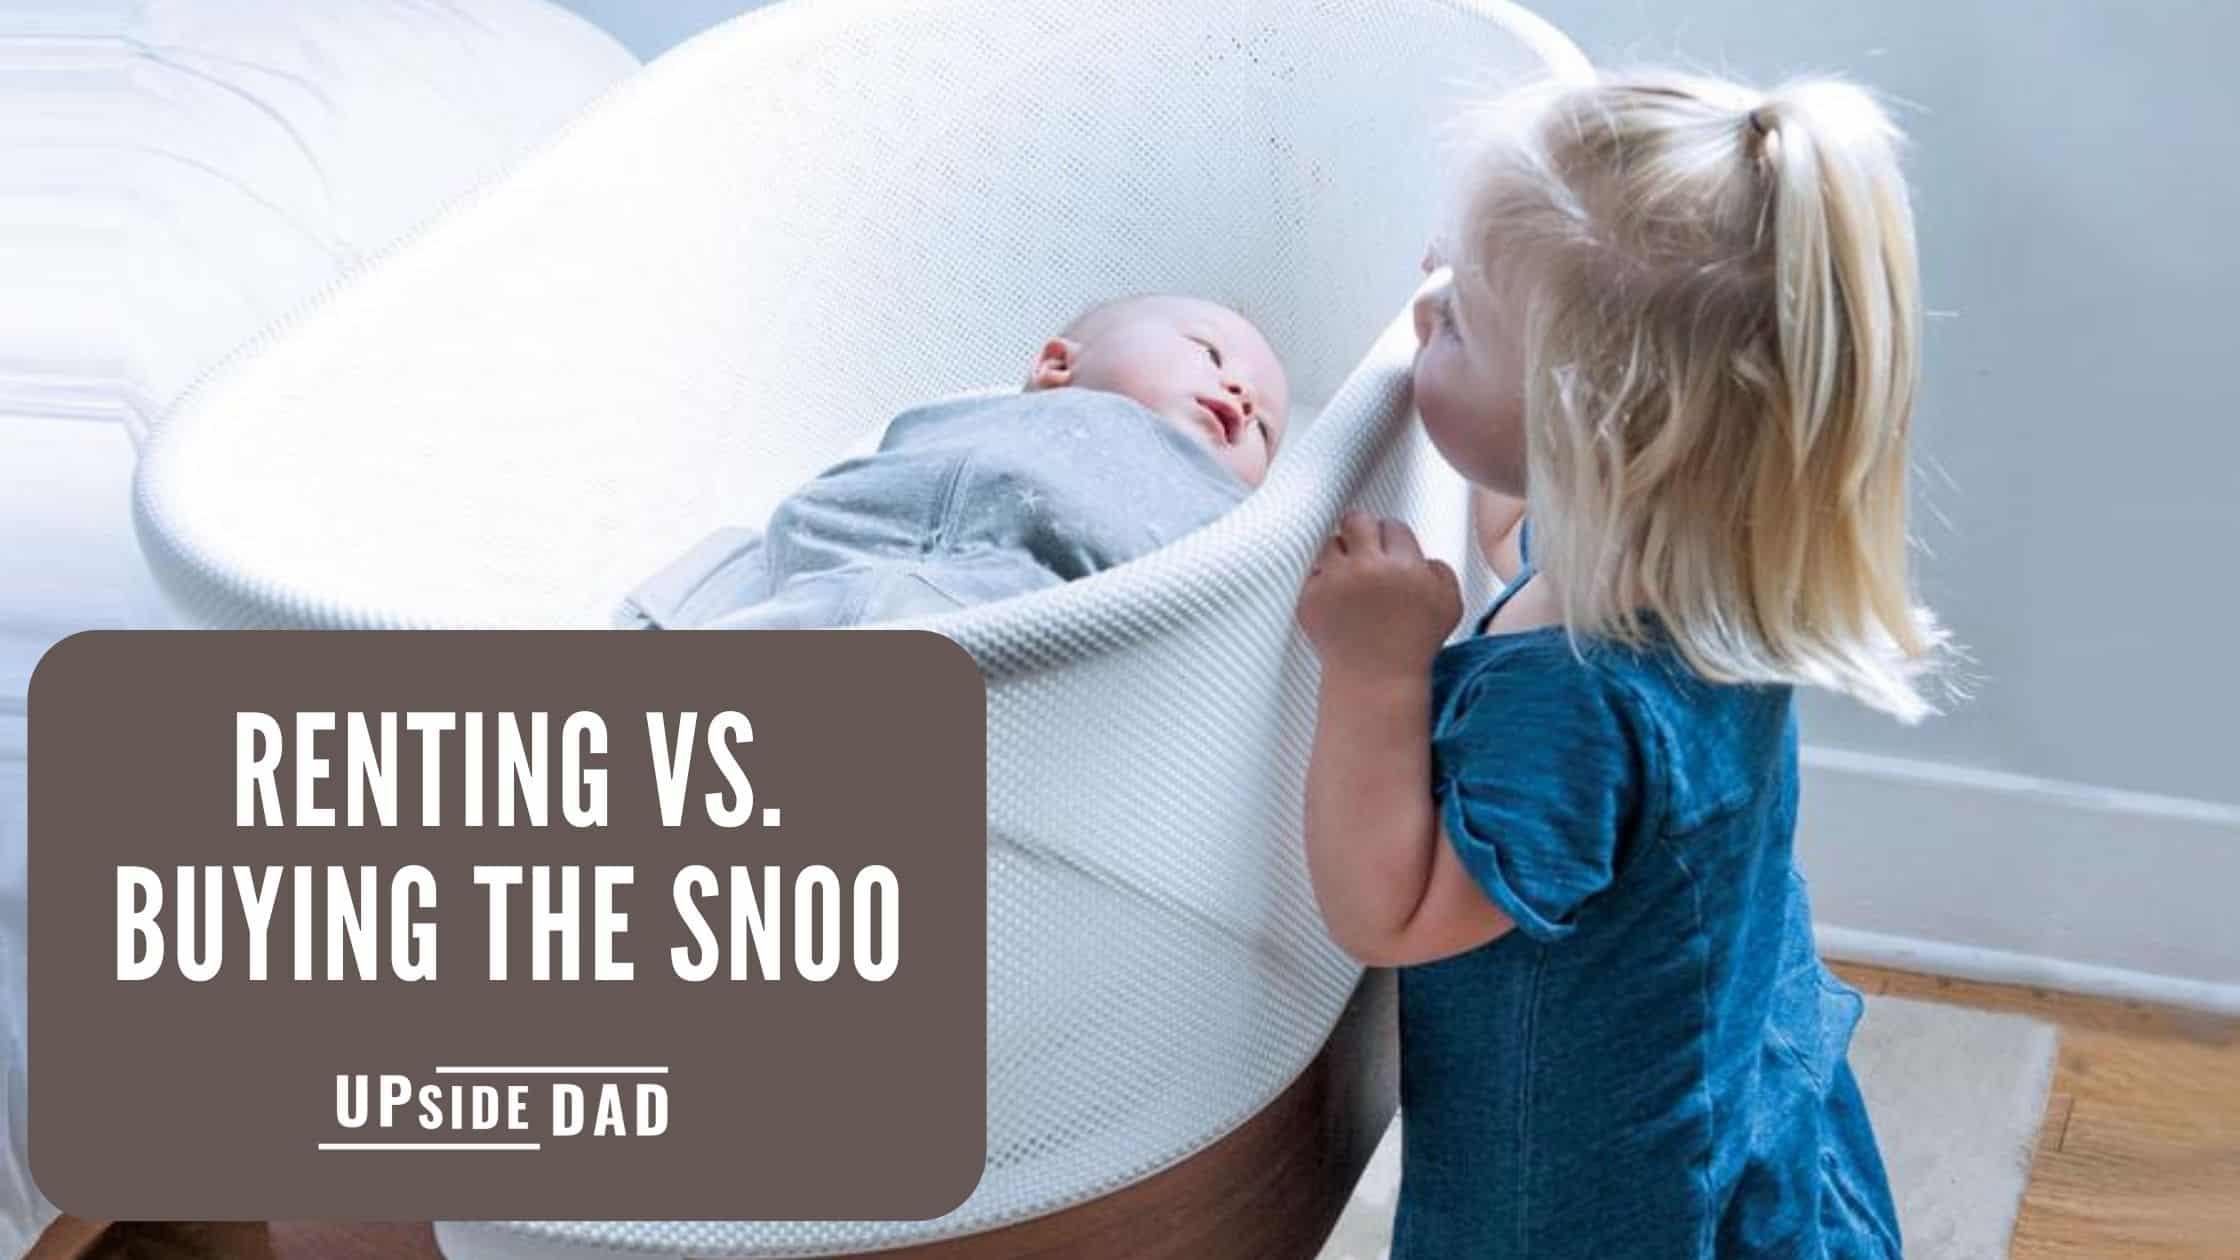 Renting vs. buying the SNOO